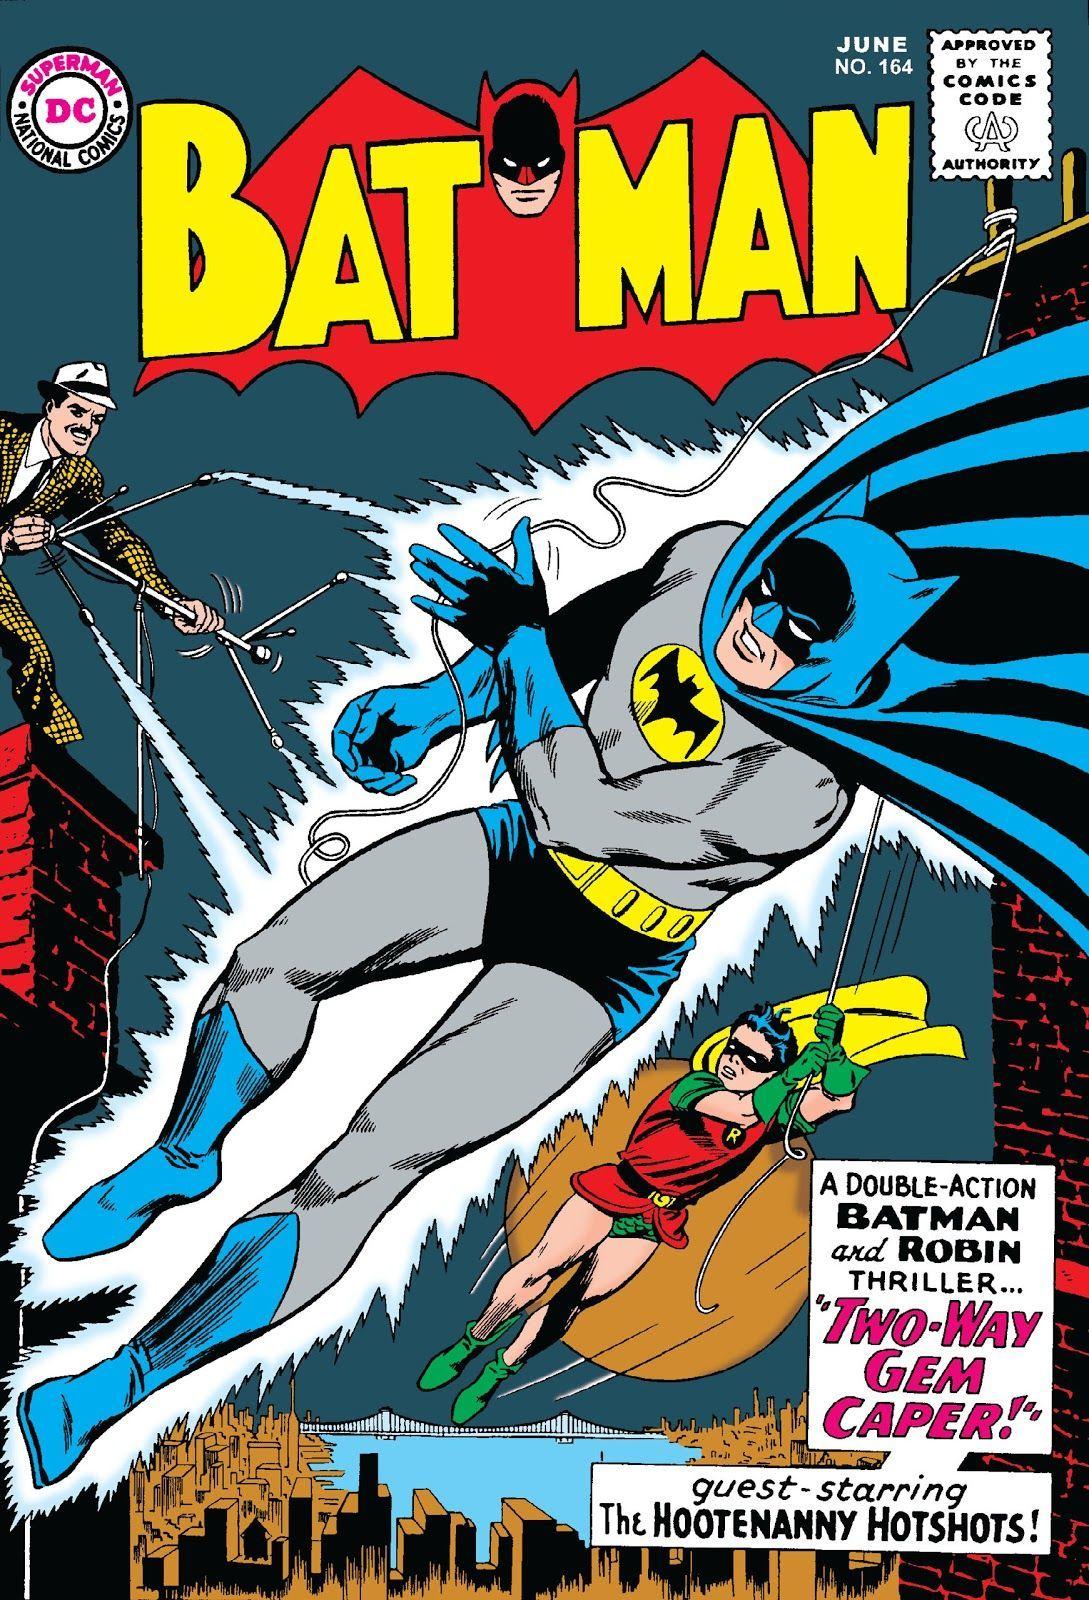 Batman #164 (Writer: Ed Herron, Artists: Sheldon Moldoff, Joe Giella)